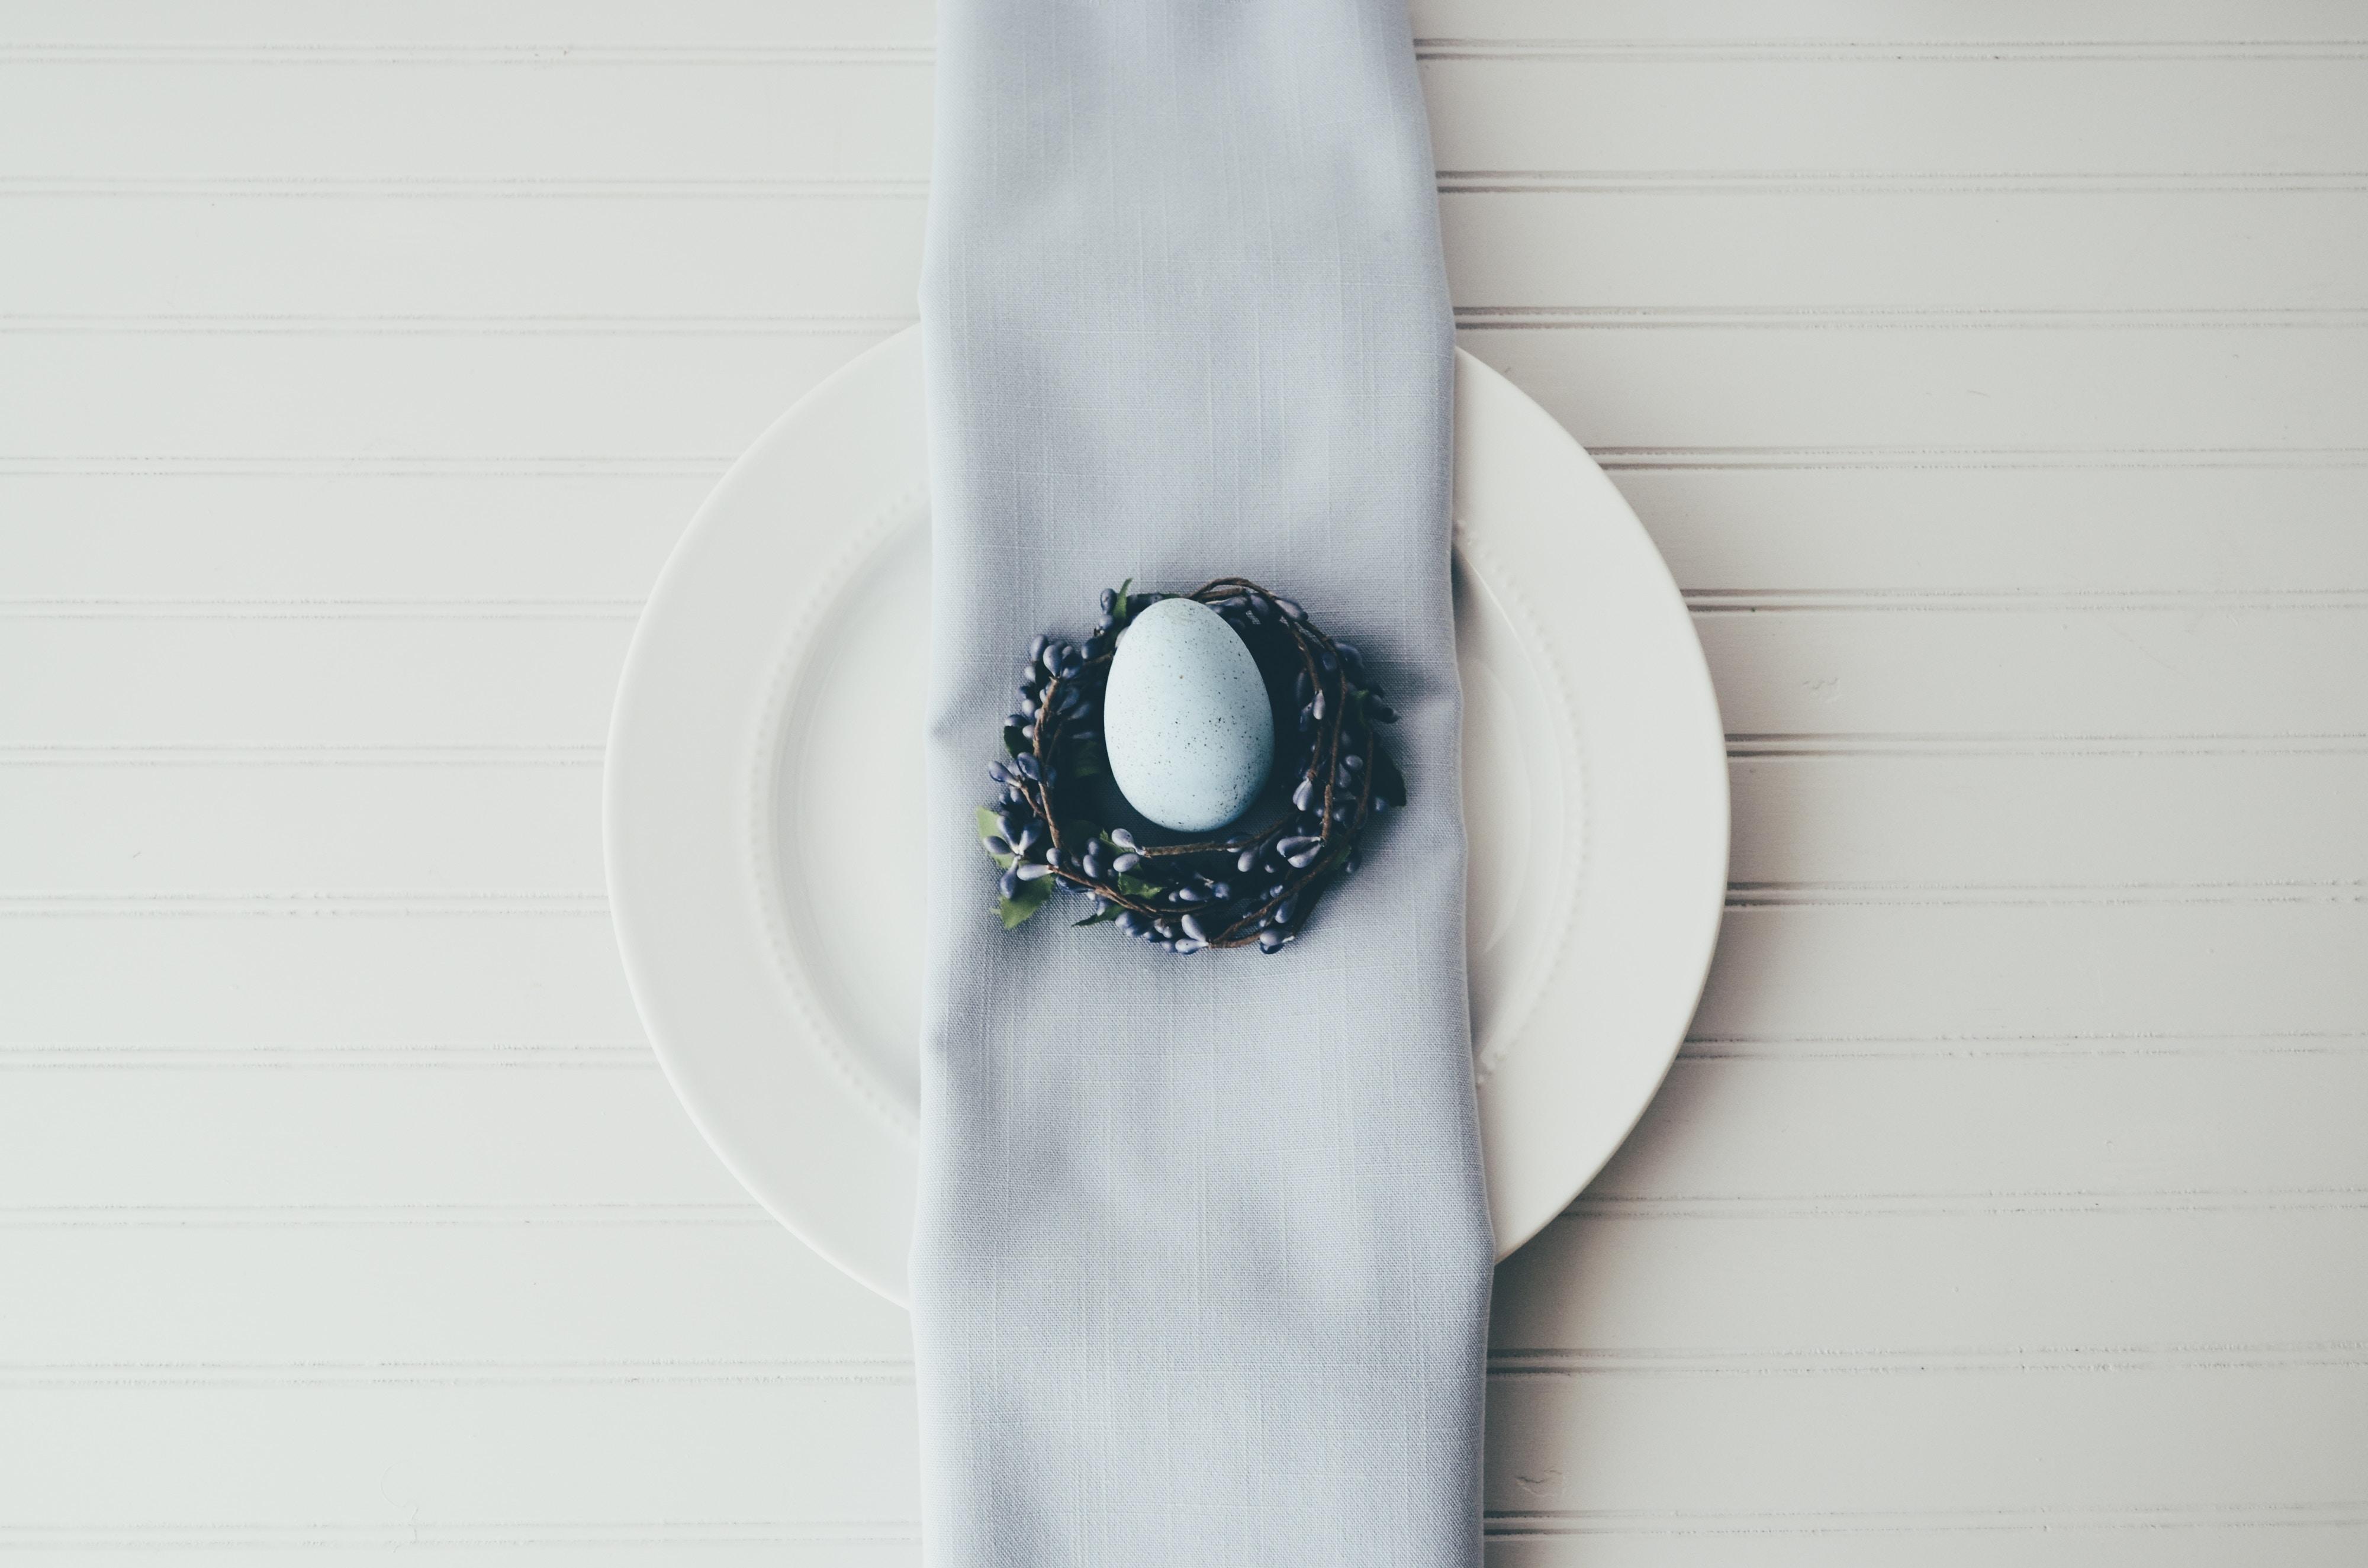 wielkanocne jajko na talerzu